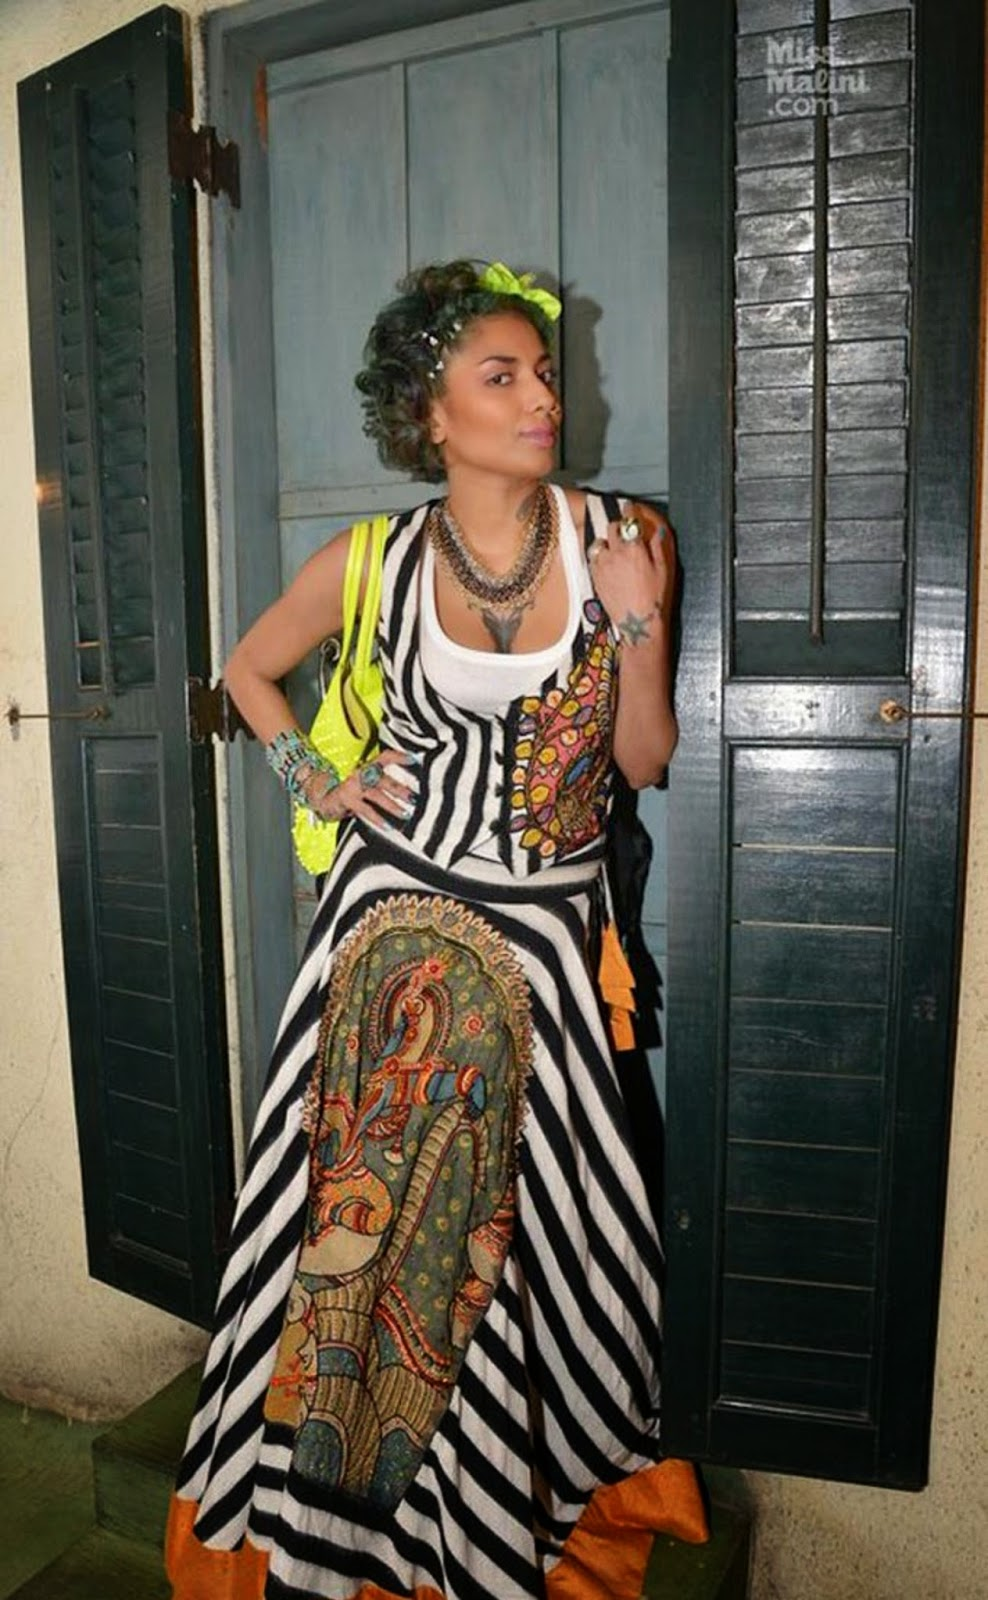 Diandra Soares Wallpapers Free Download